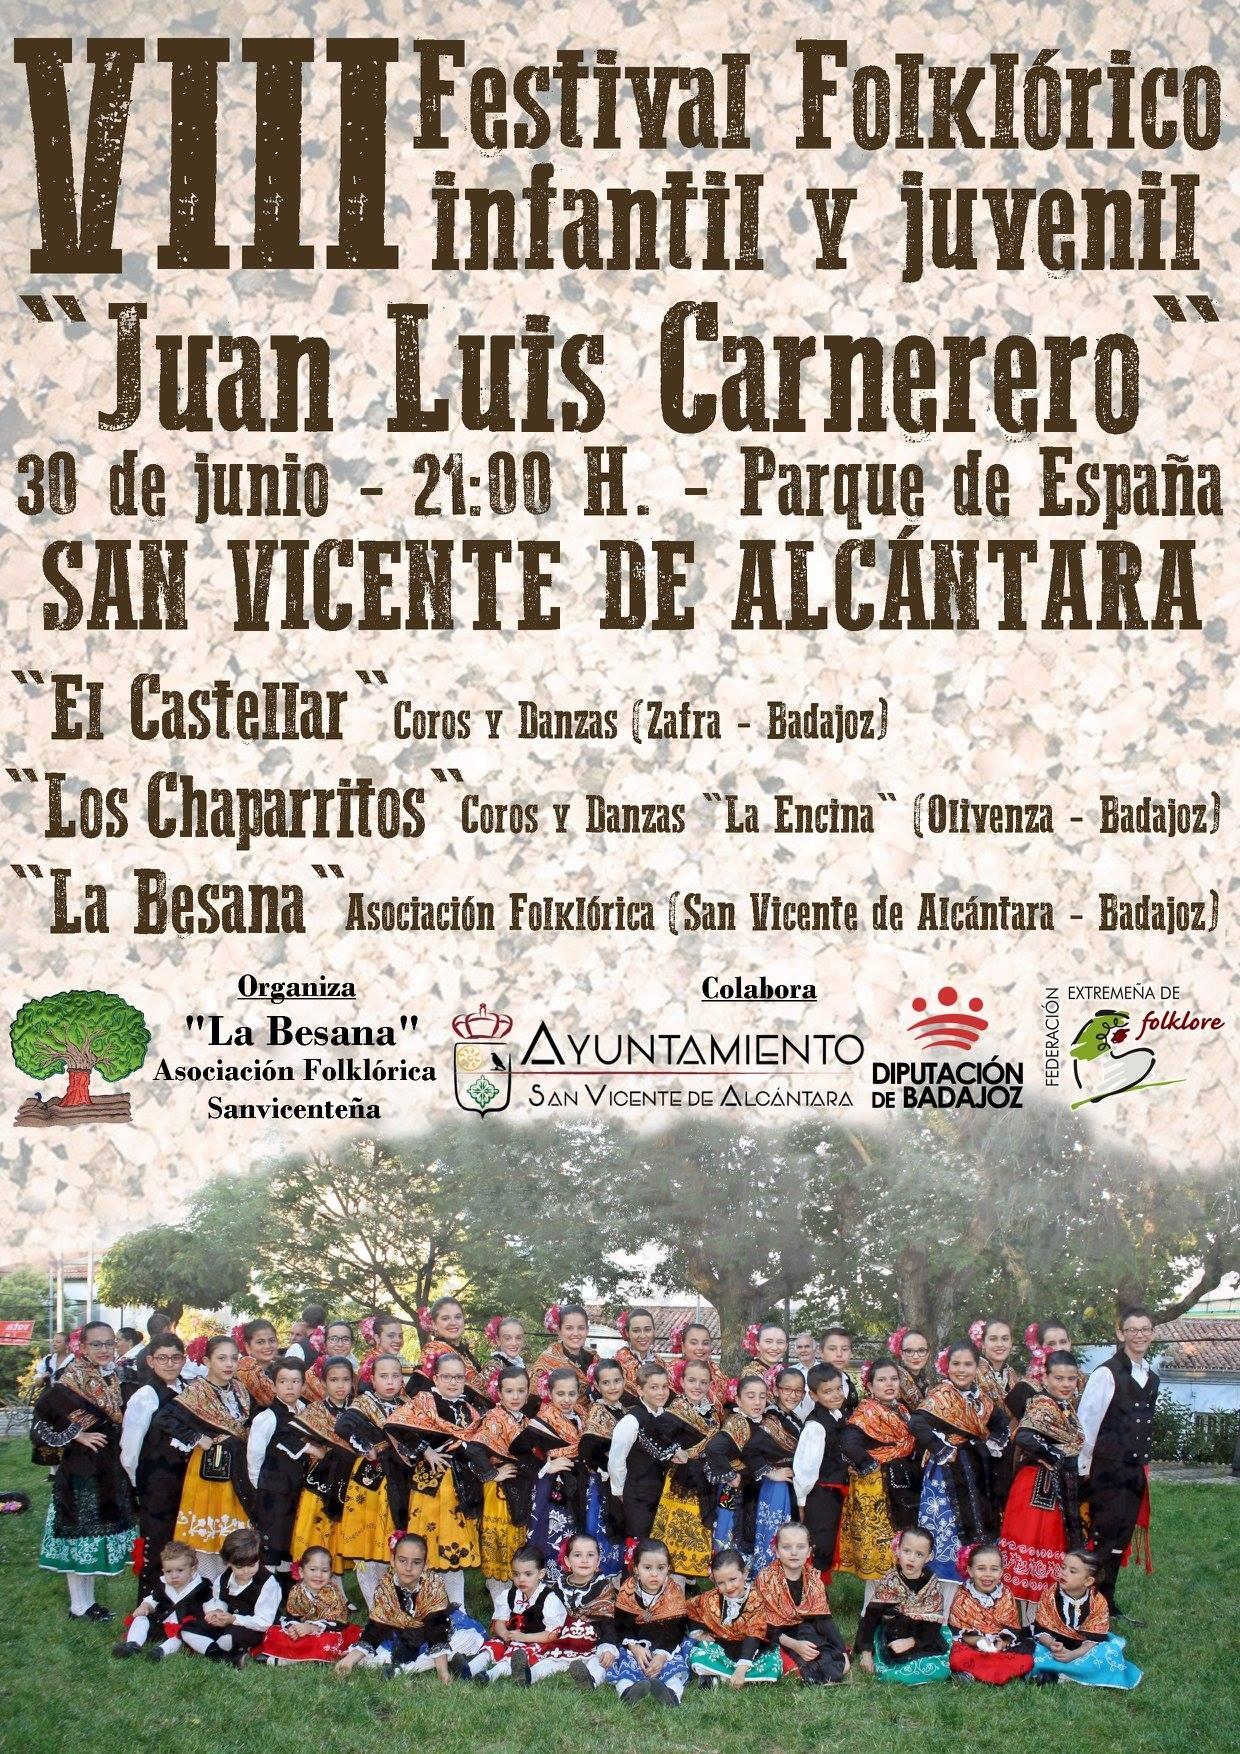 VIII Festival Folklórico Infantil y Juvenil 'JUAN LUIS CARNERERO'